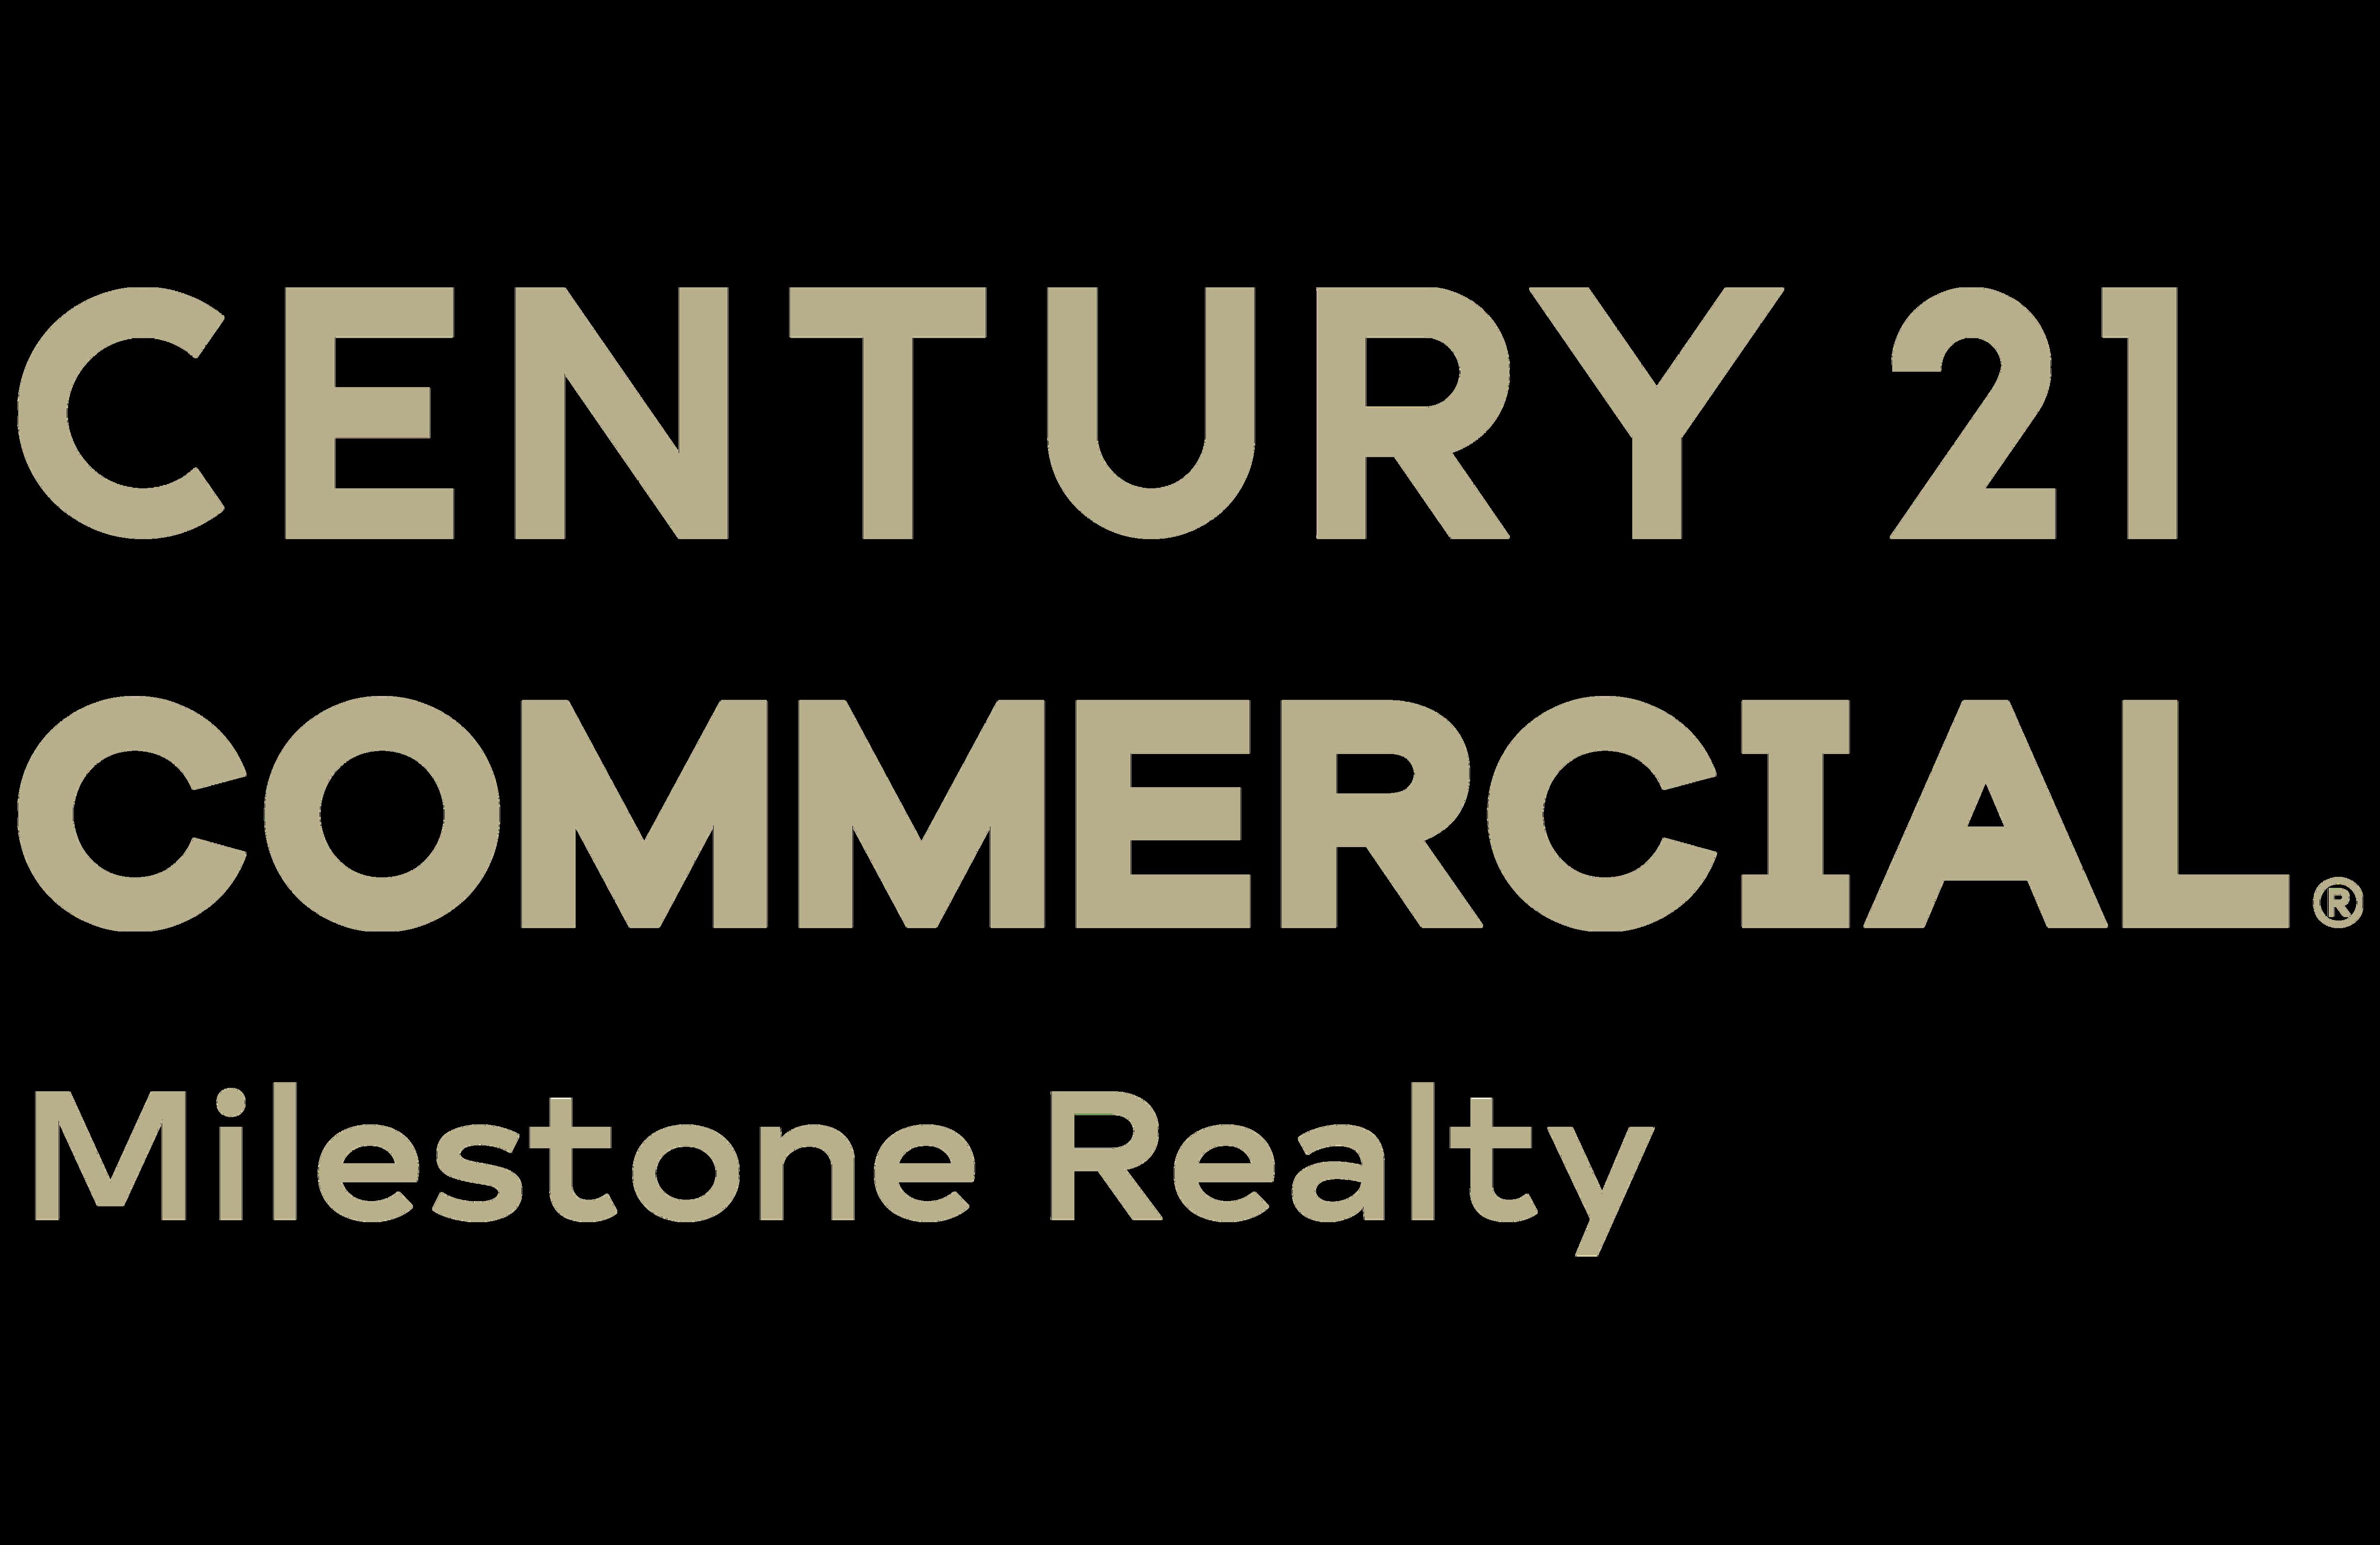 CENTURY 21 Milestone Realty